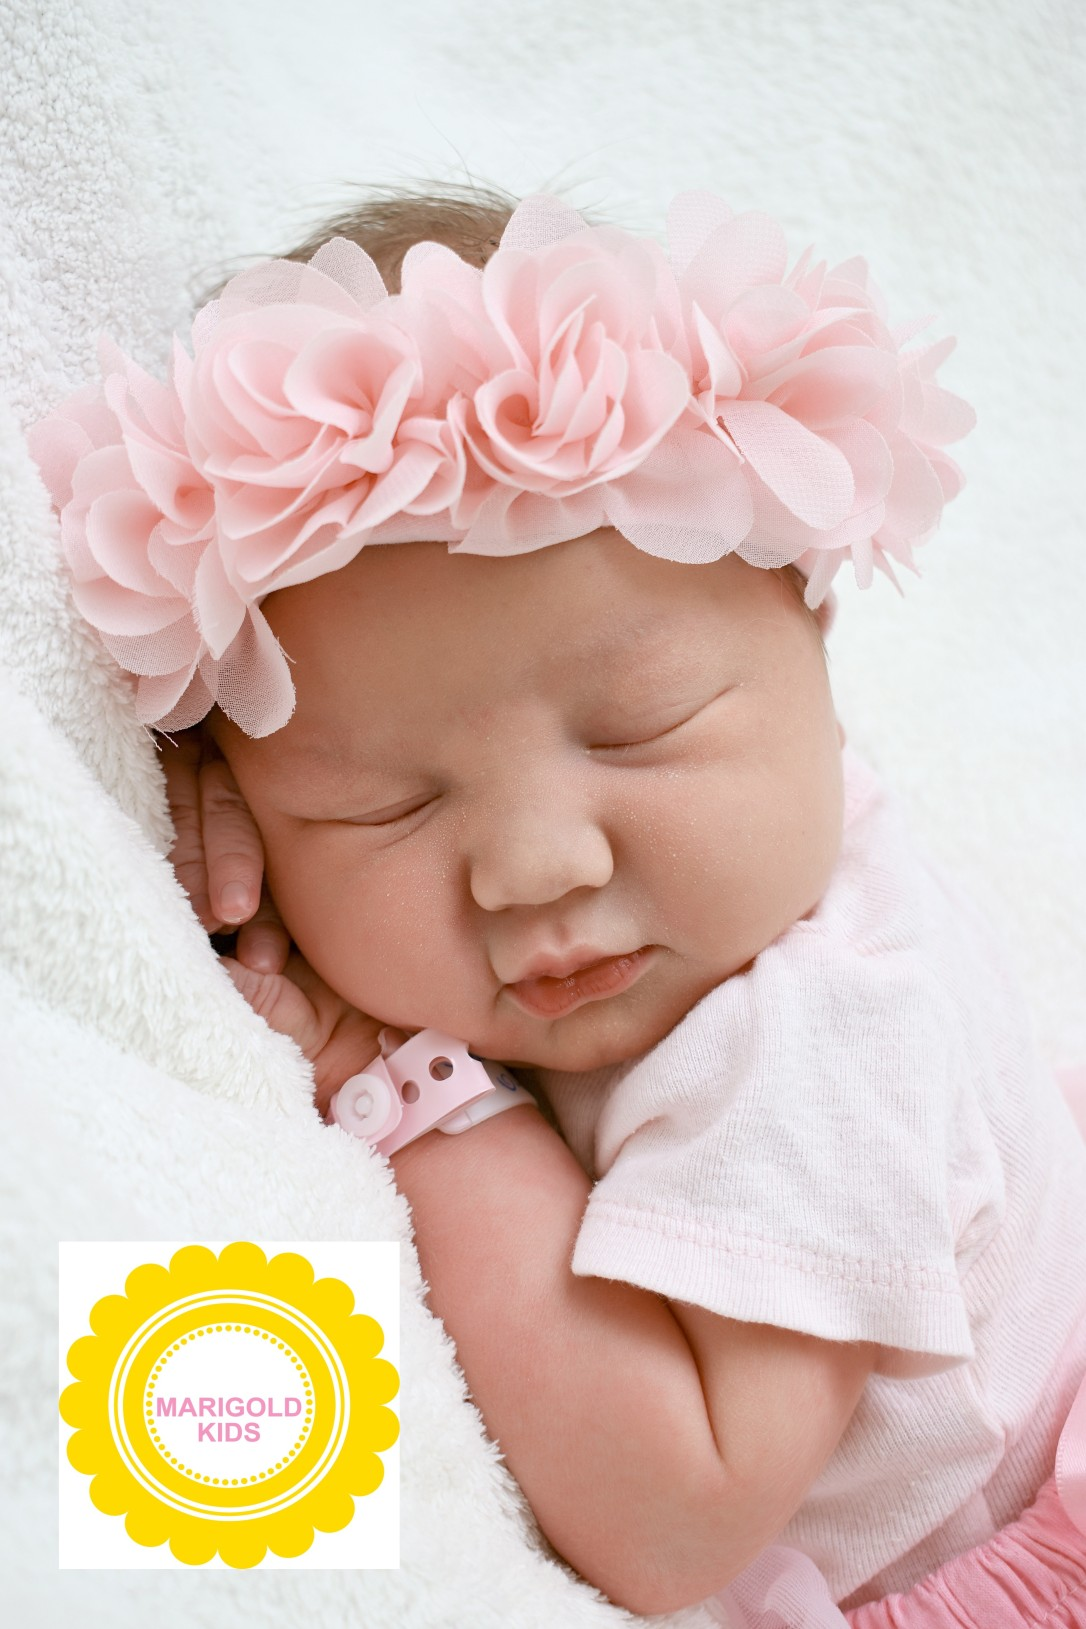 pinknewbornbaby_logo